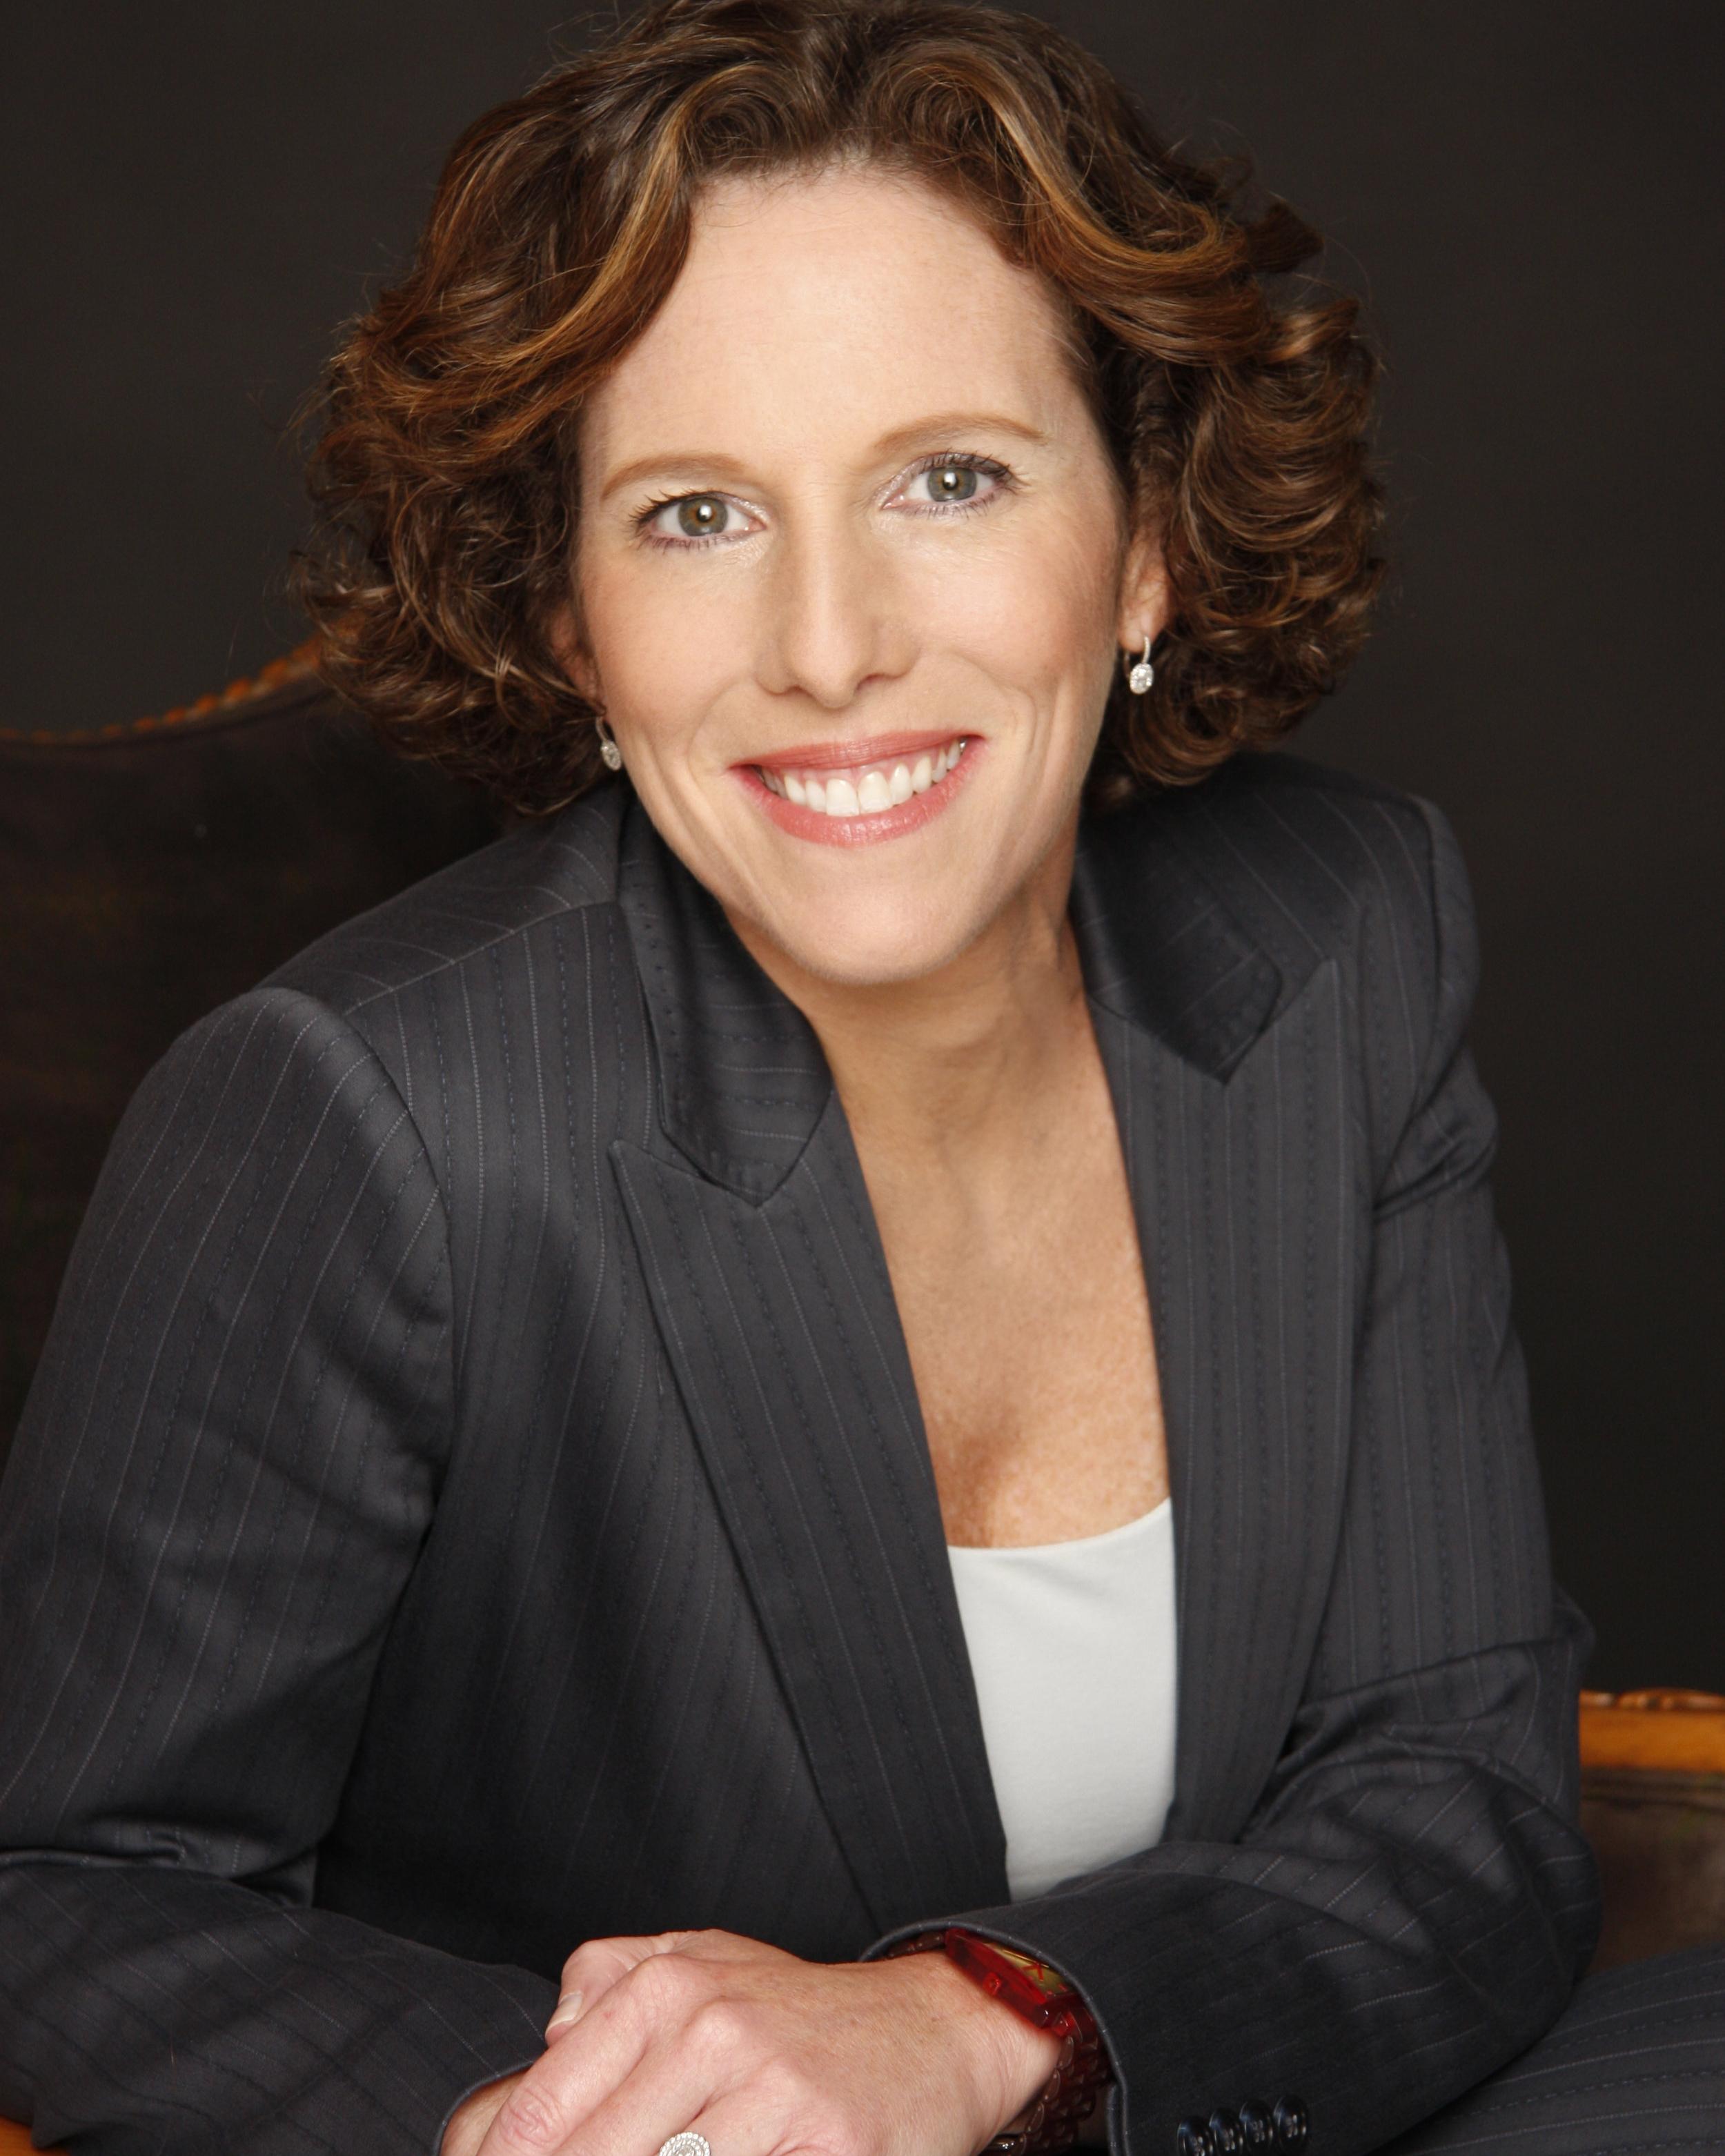 attorney portrait corporate photography by New York corporate photographer Michael Benabib.jpg